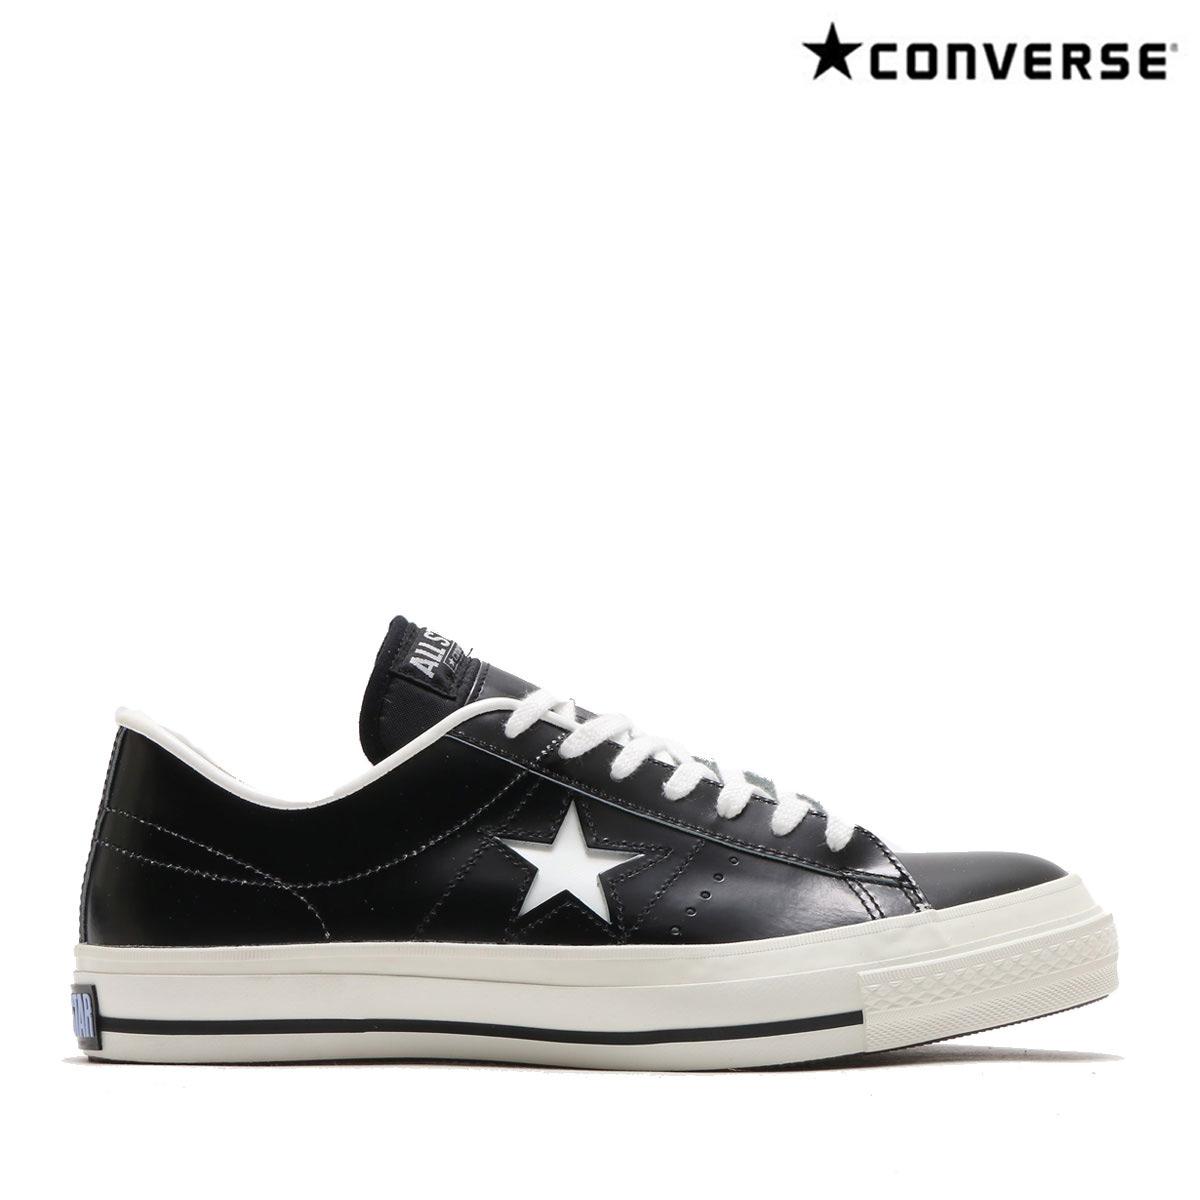 CONVERSE ONE STAR J(BLACK/WHITE)(コンバース ワン スター J)【ユニセックス】【スニーカー】【MADE IN JAPAN】【日本製】【CRYOVR】【10】【sale0123】